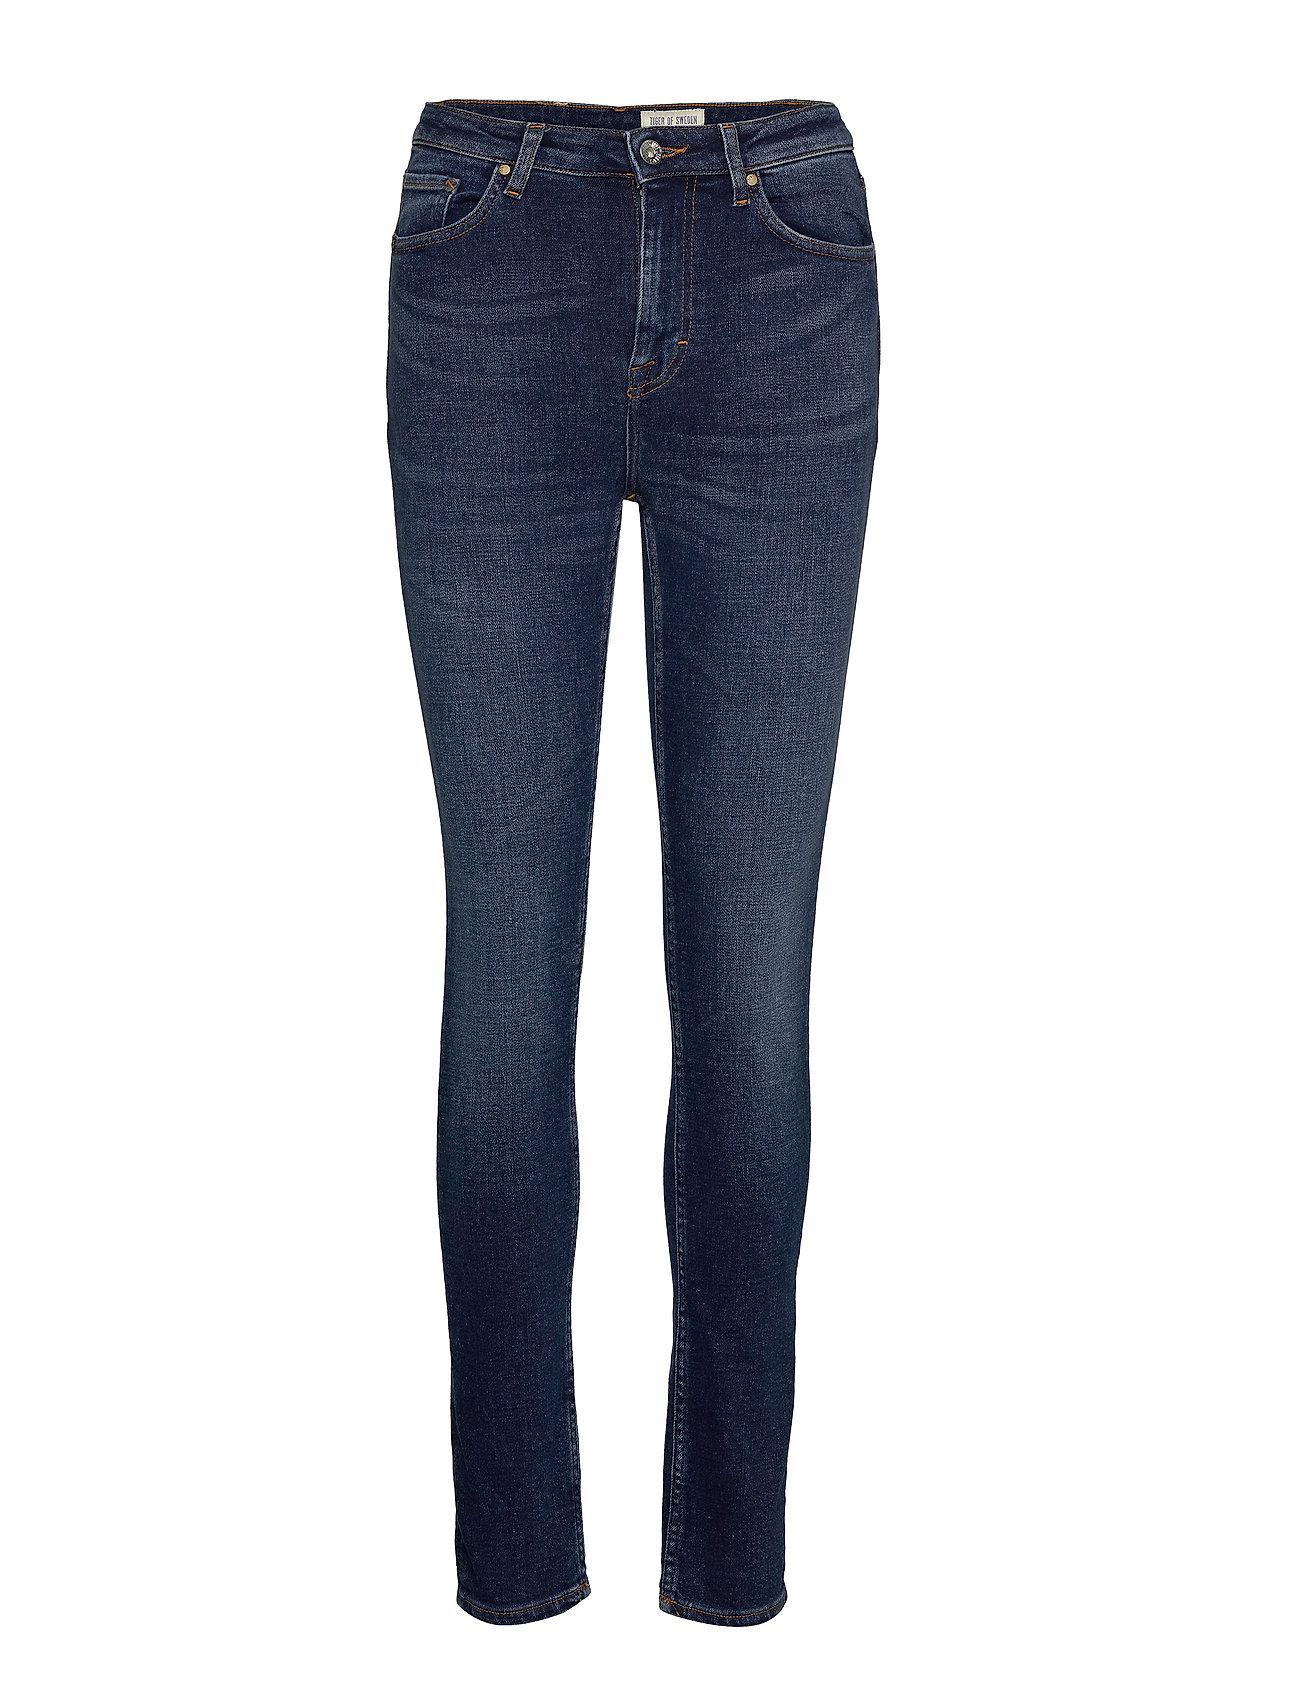 Tiger of Sweden Jeans SHELLY - ROYAL BLUE